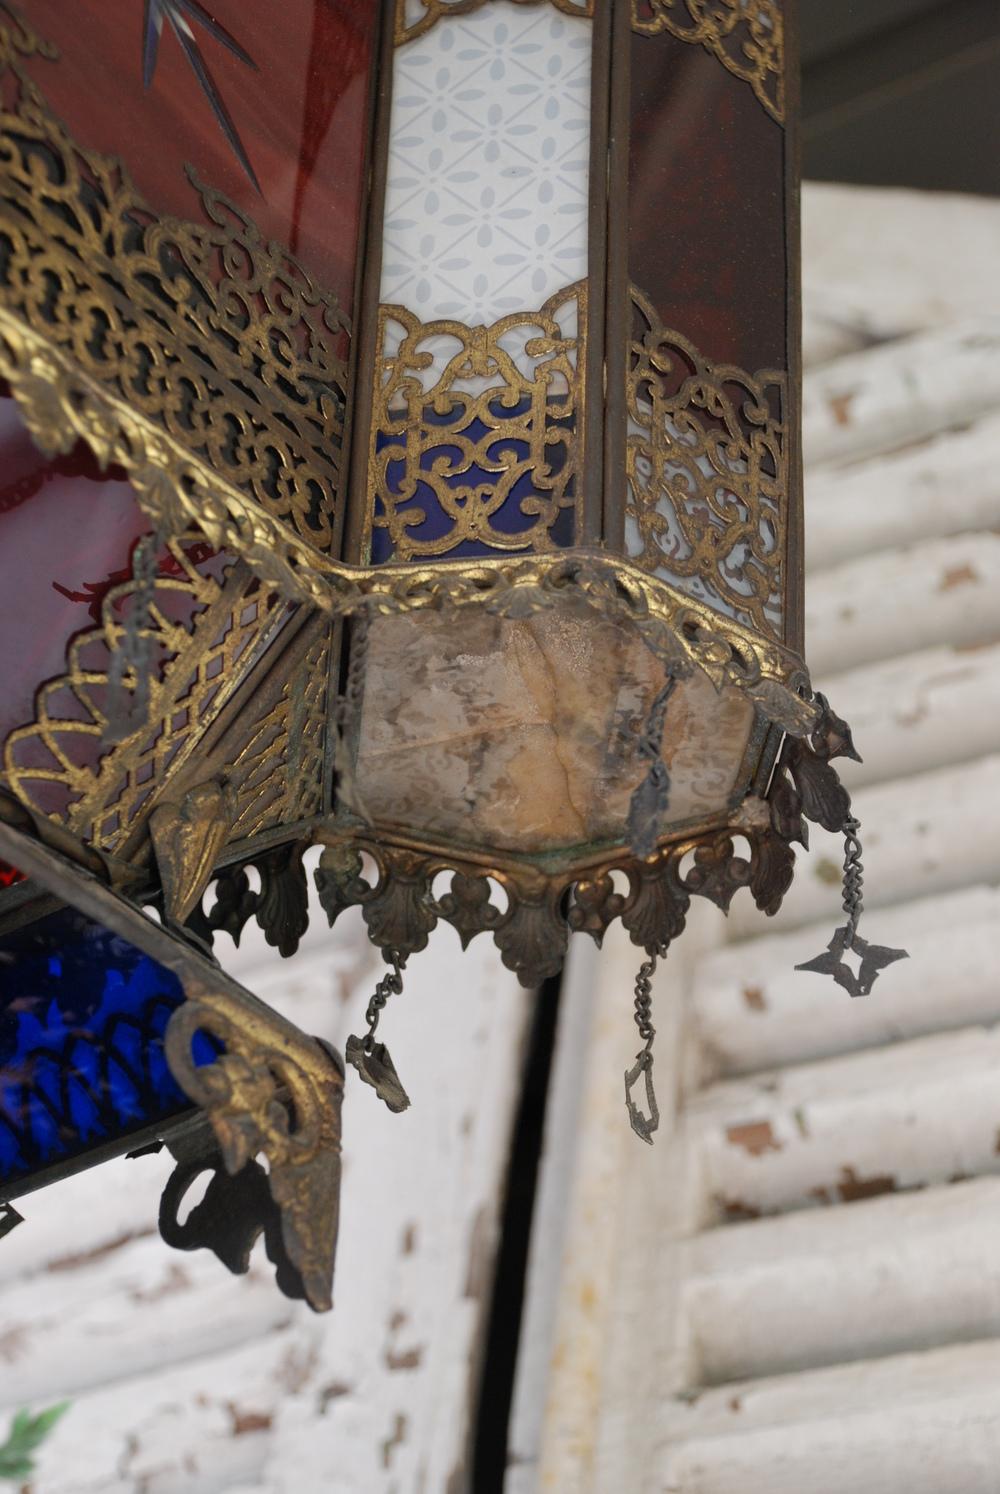 Antique Moroccan Lantern Hangs Overhead